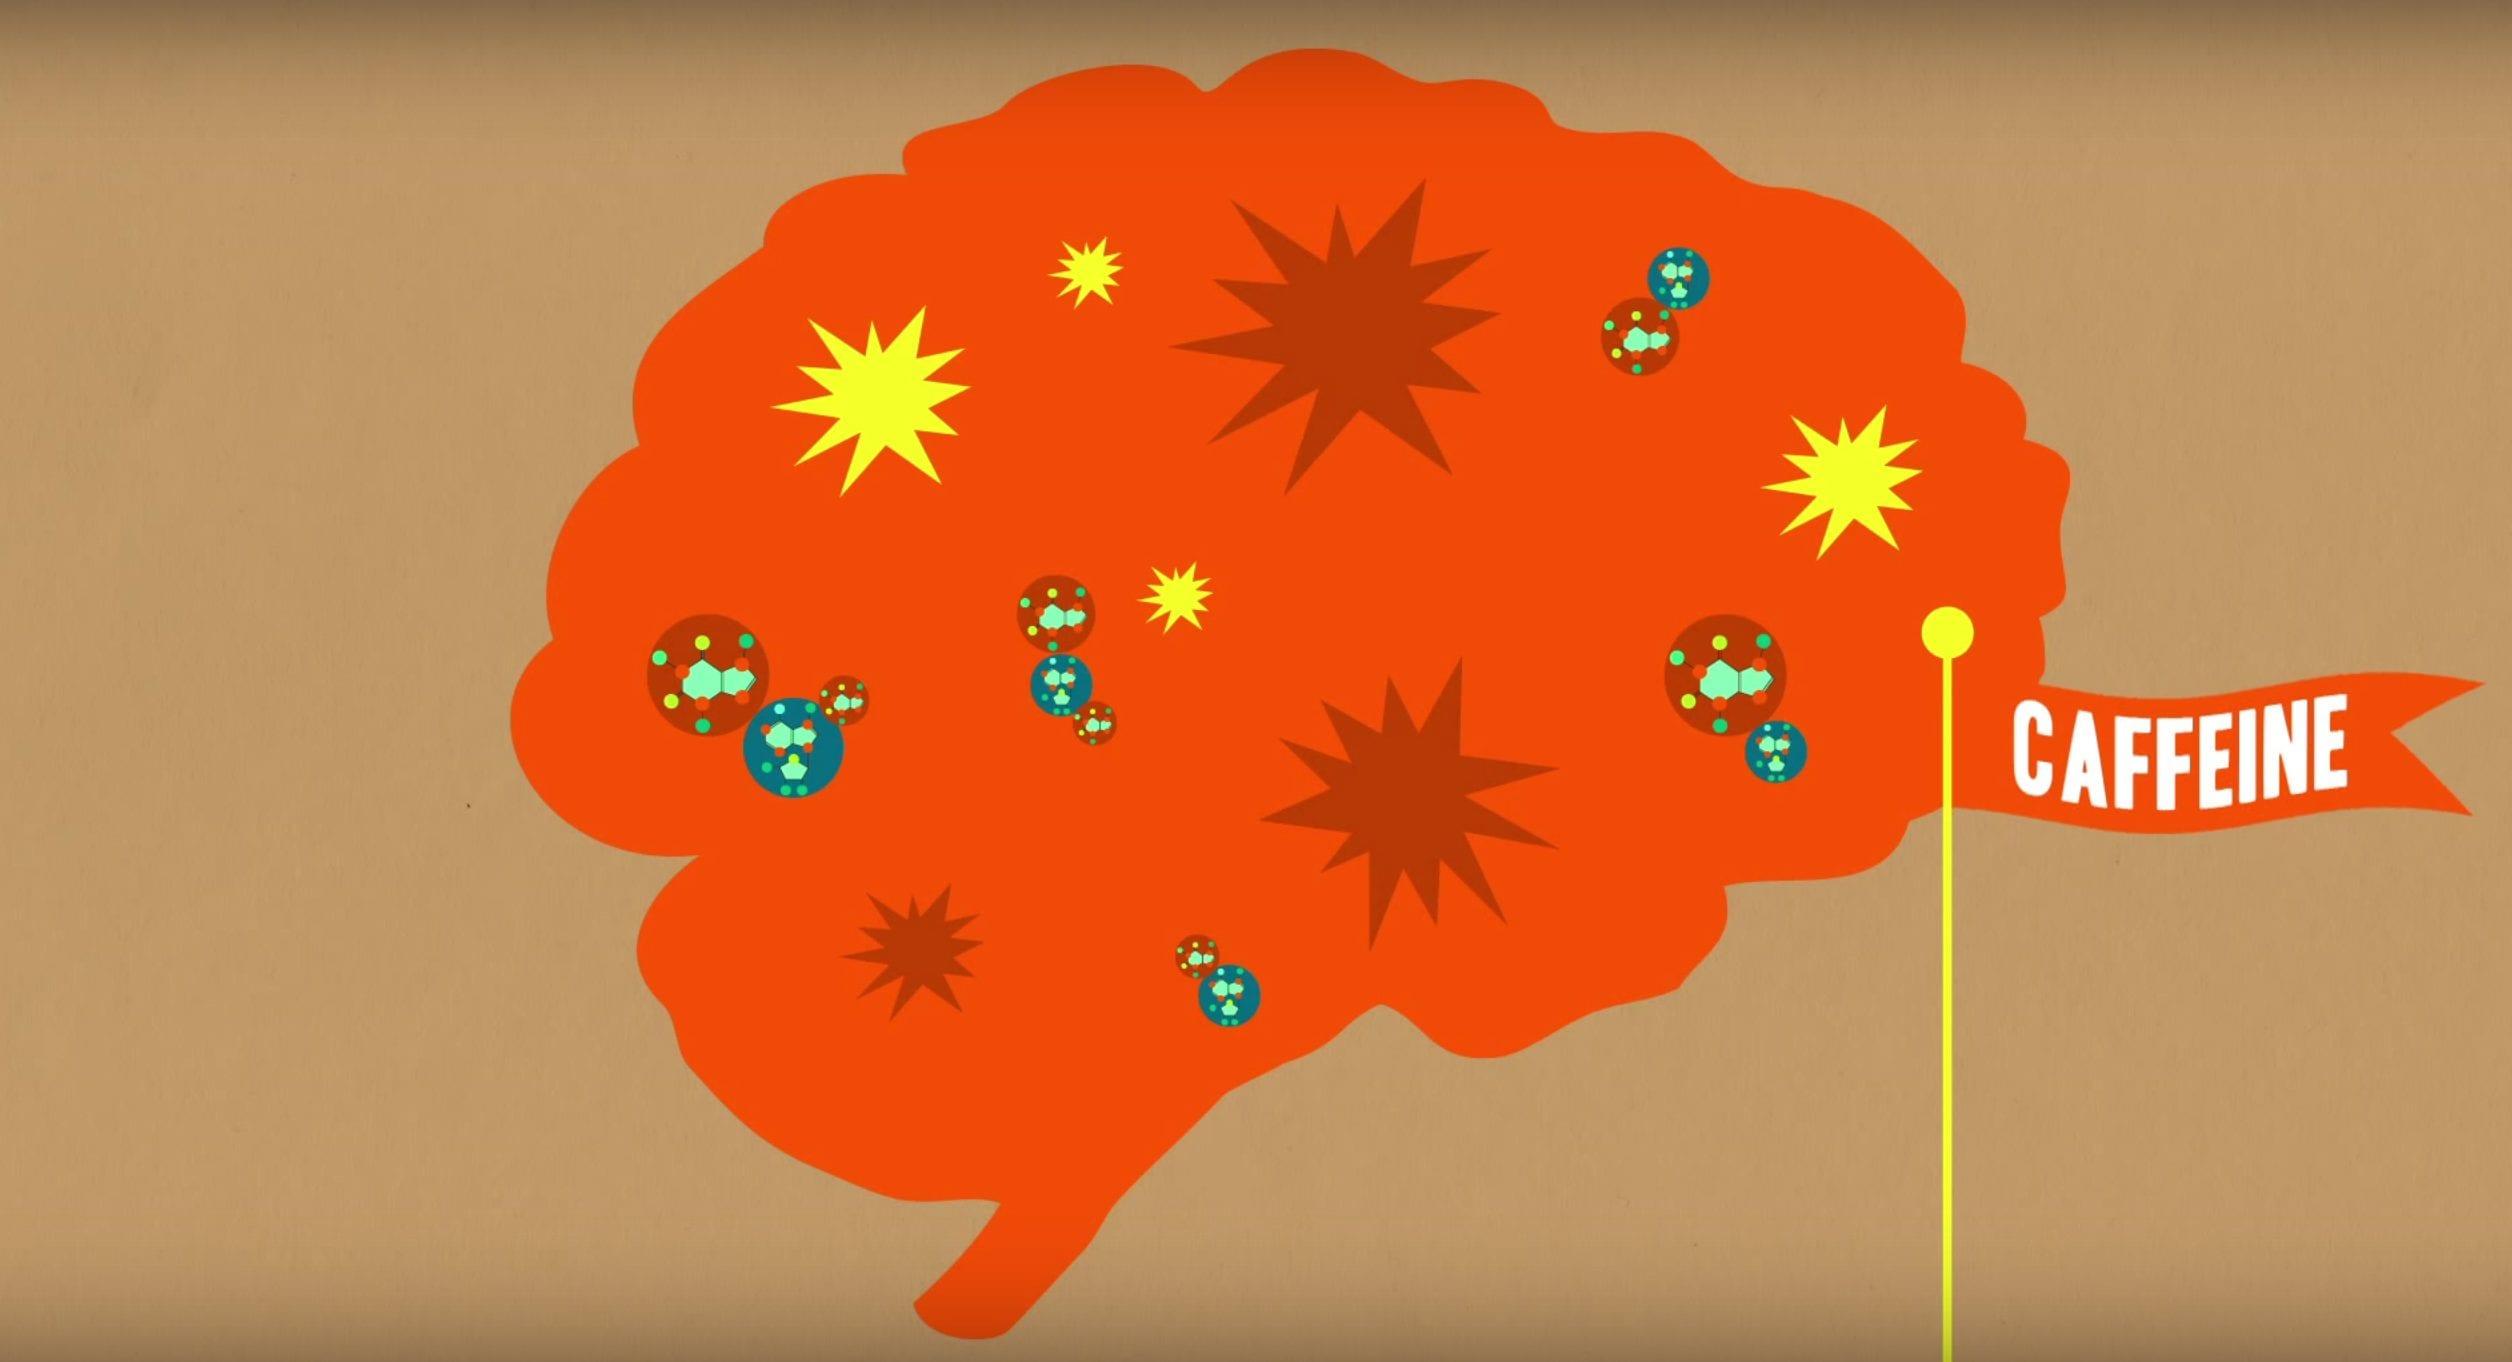 caffeine affect on brain